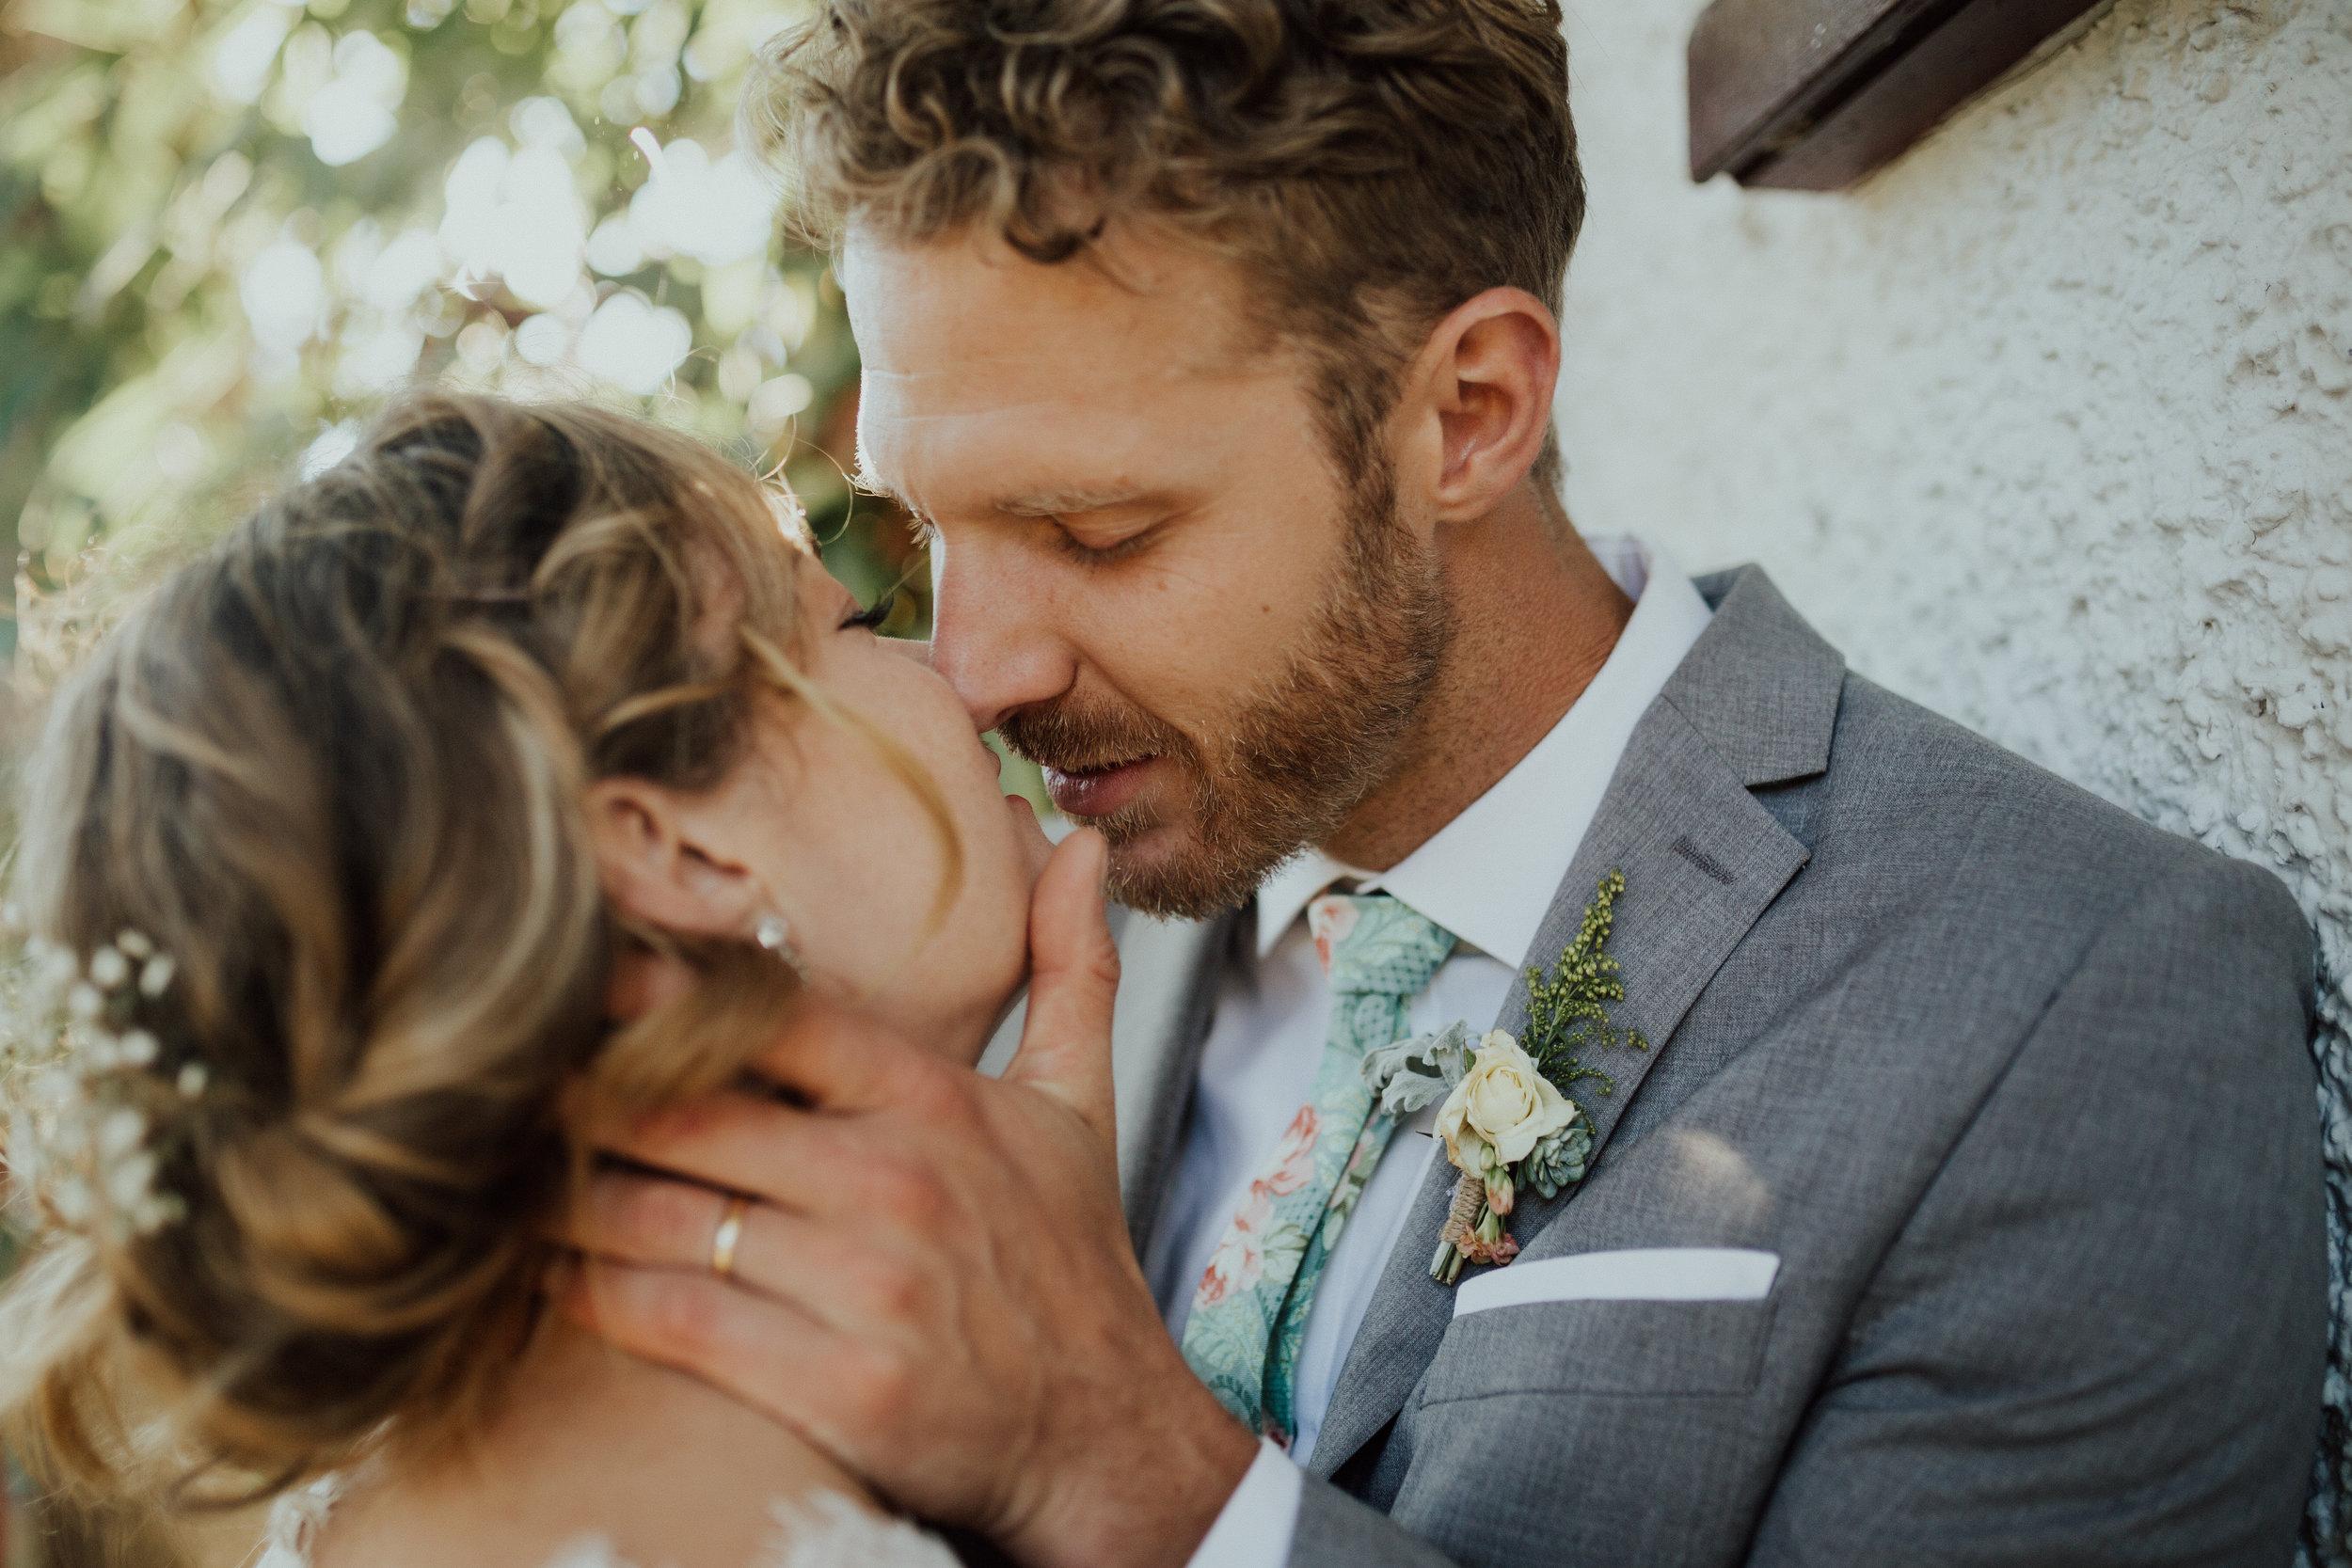 Victoria wedding photographer pricing